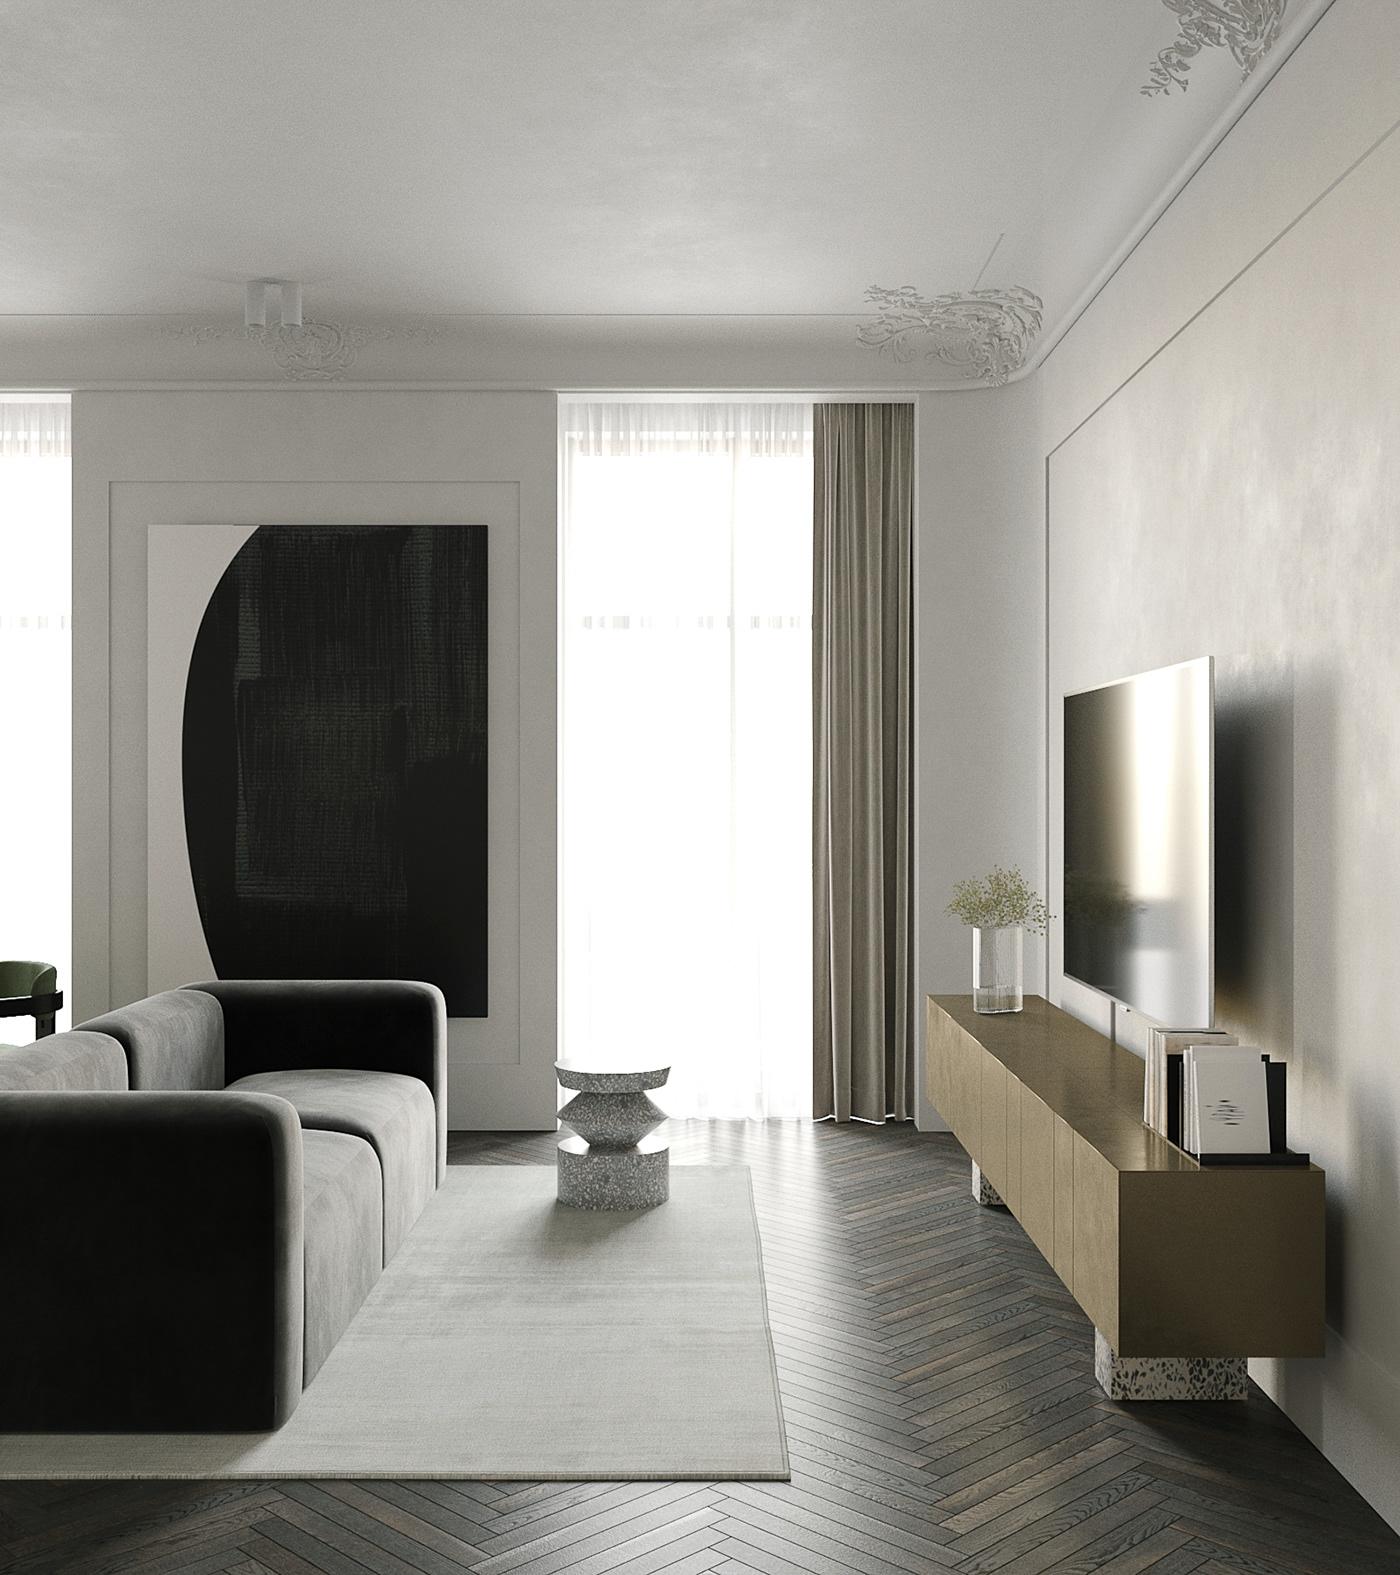 classical interior interior design  modern and classic modern interior apartment interior design appartment interior archviz Interior SGI